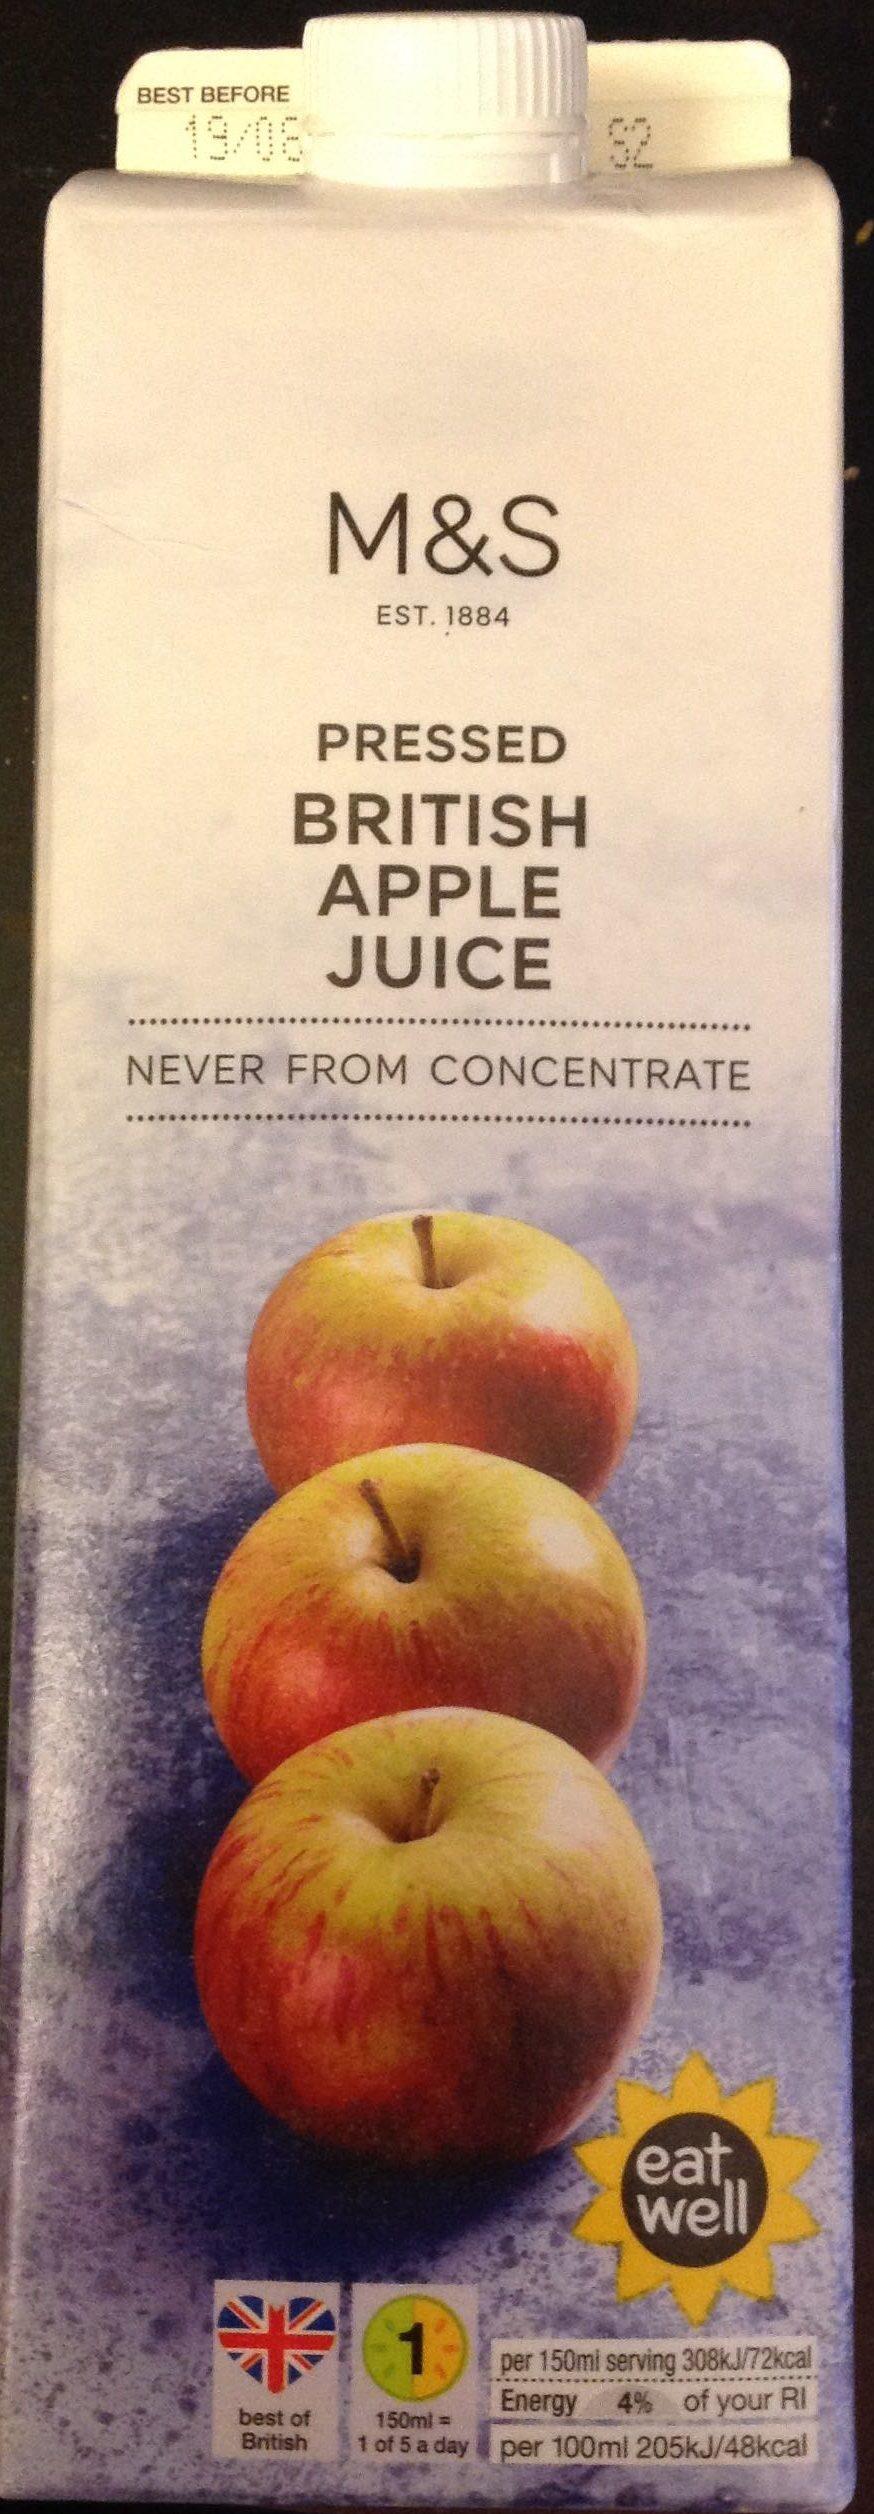 Pressed British Apple Juice - Product